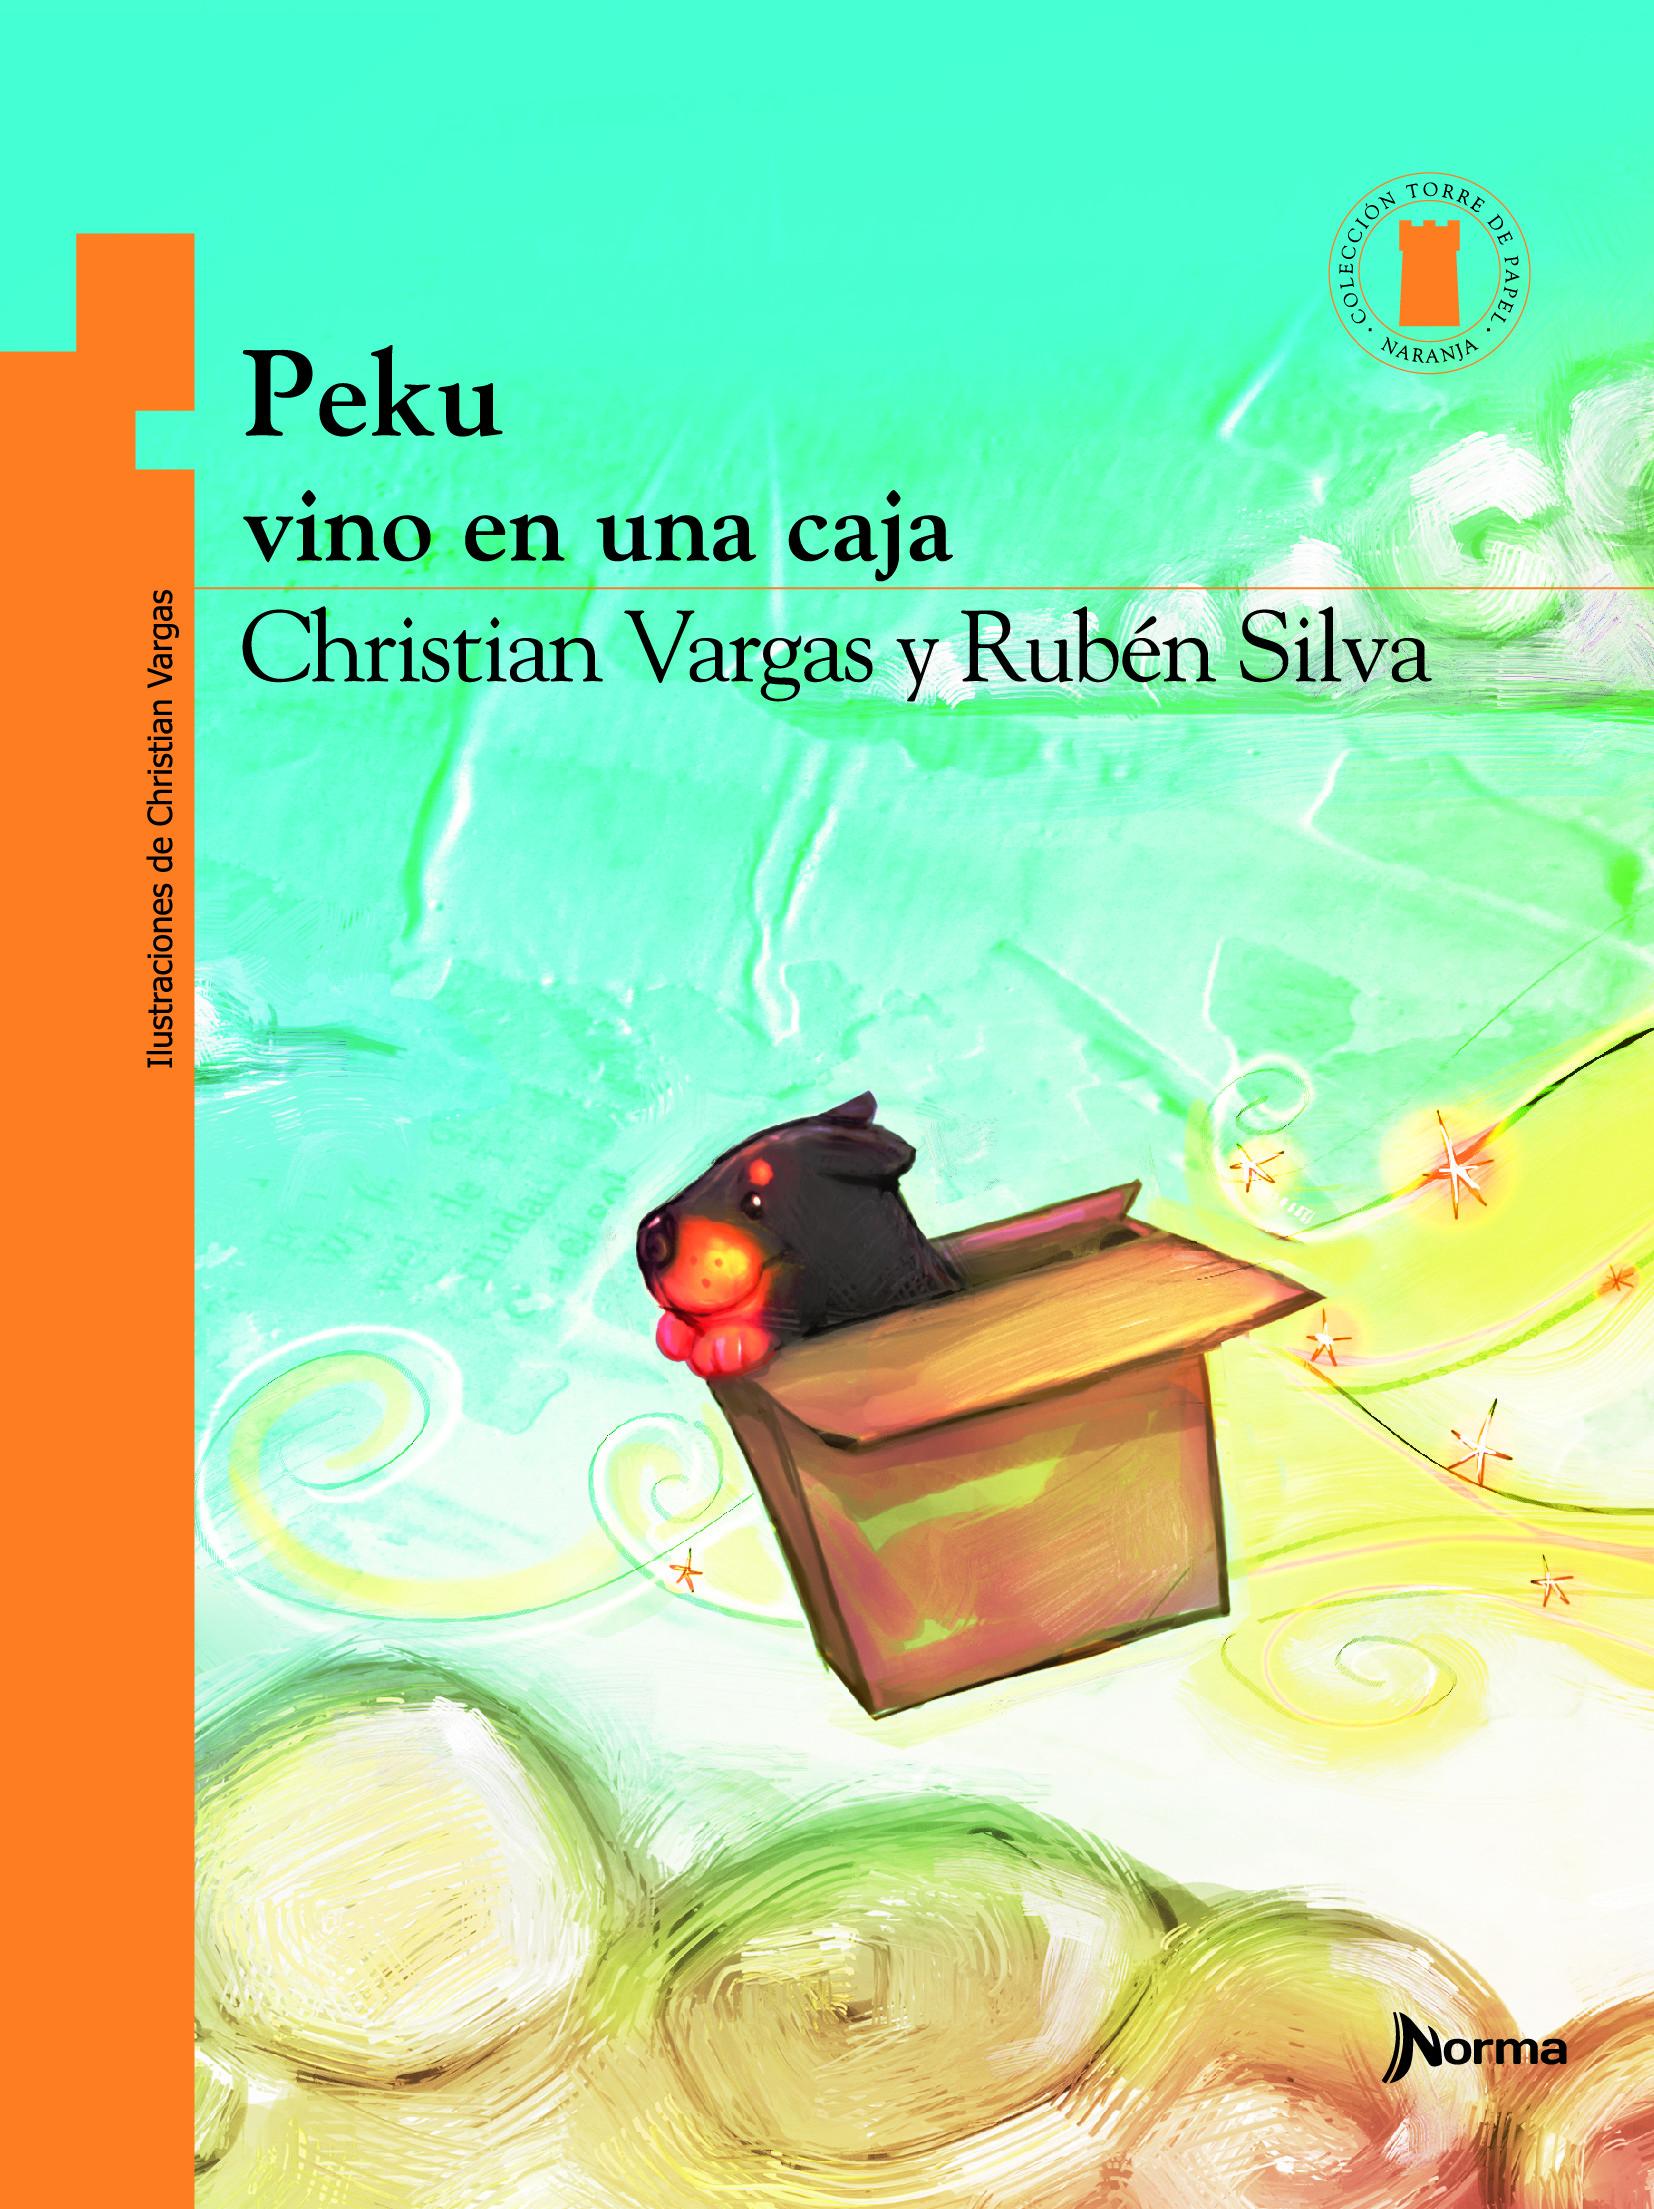 Peku vino en una caja